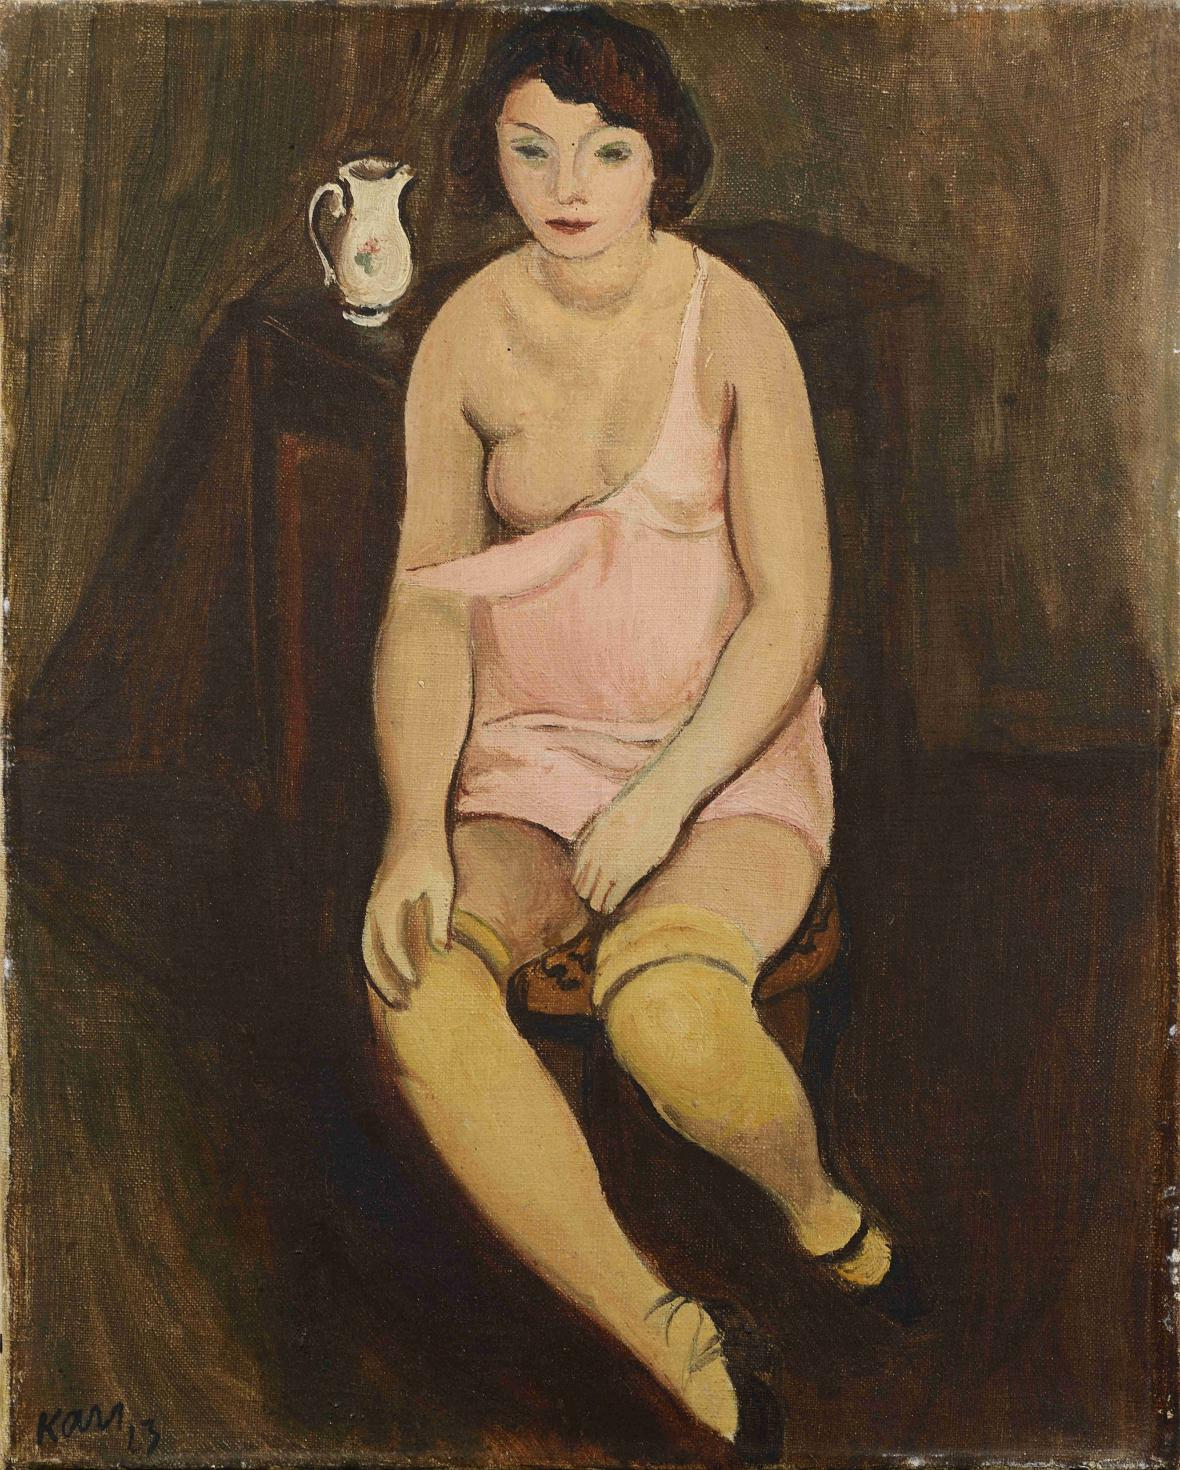 Georges Kars / Dívka se žlutými punčochami, 1923